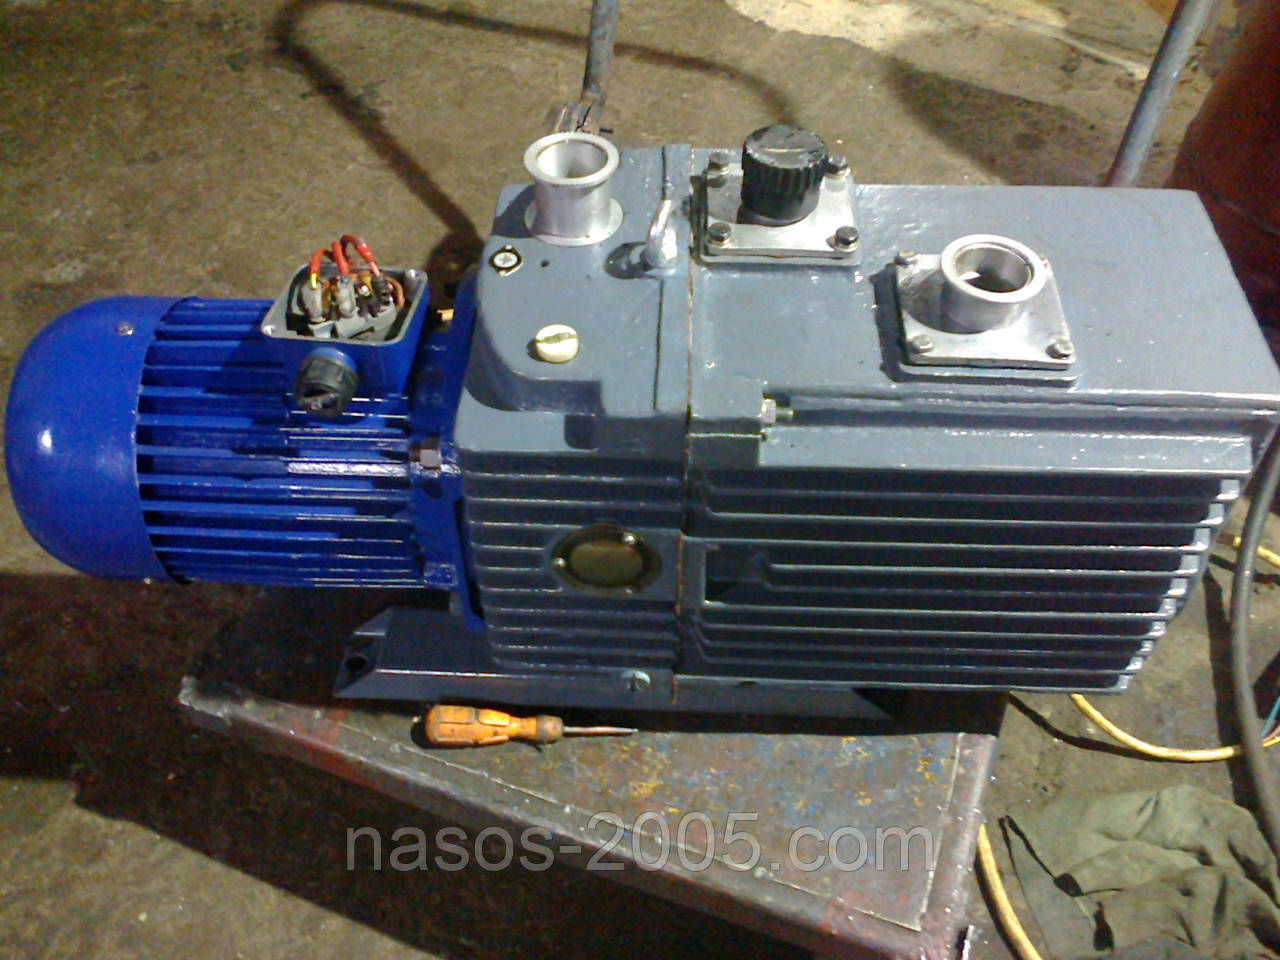 Насос 2НВР-60Д насос вакуумный 2НВР-60Д роторный вакуумный насос